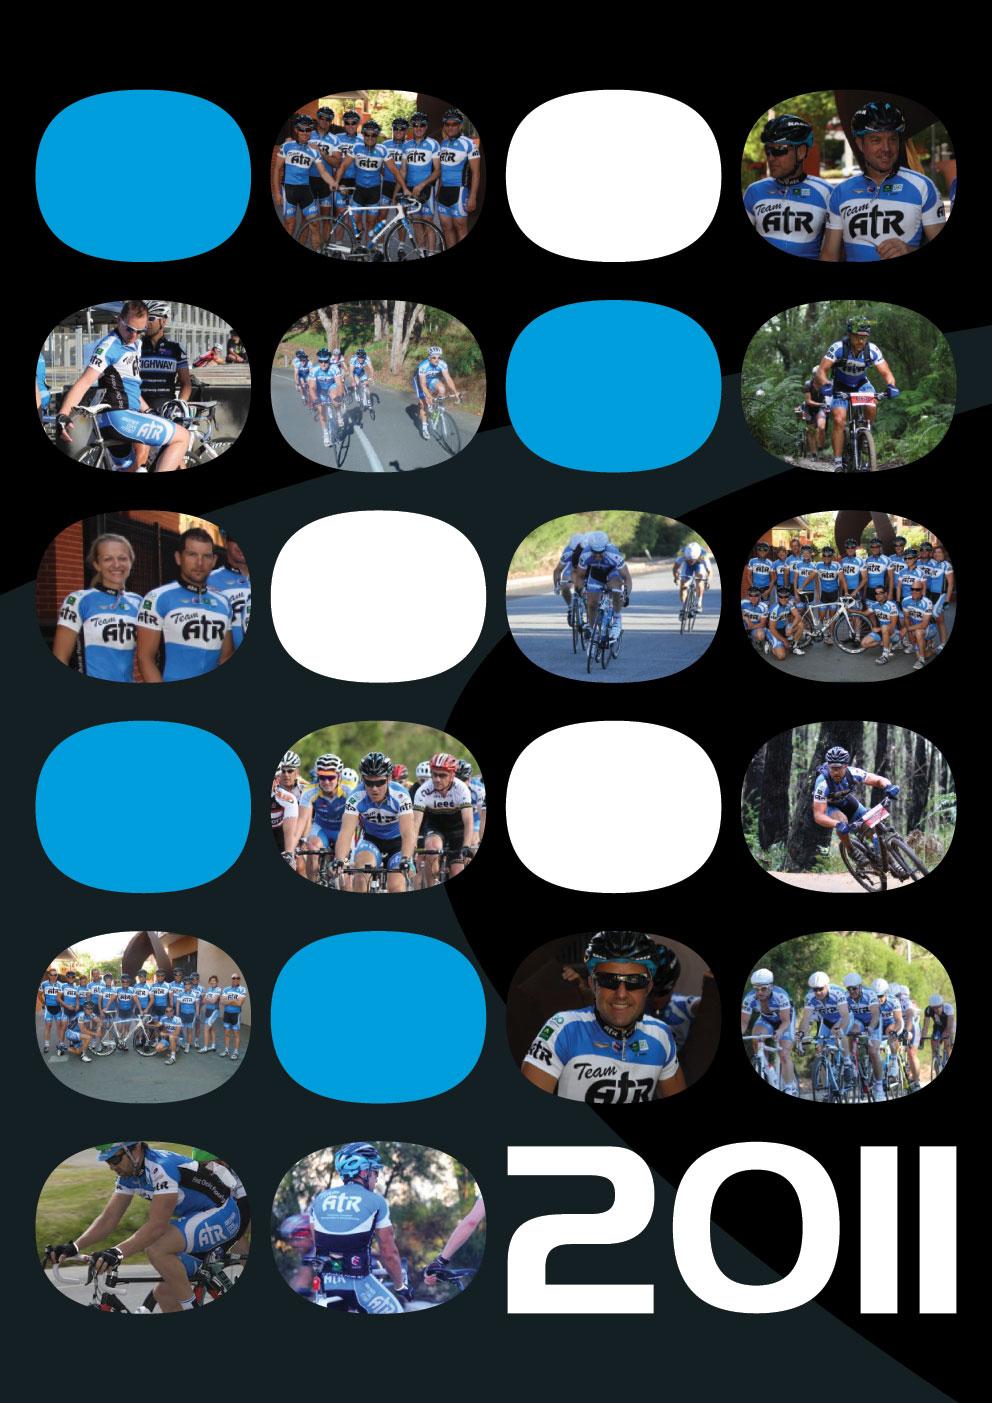 team_atr_profile_2011-4.jpg